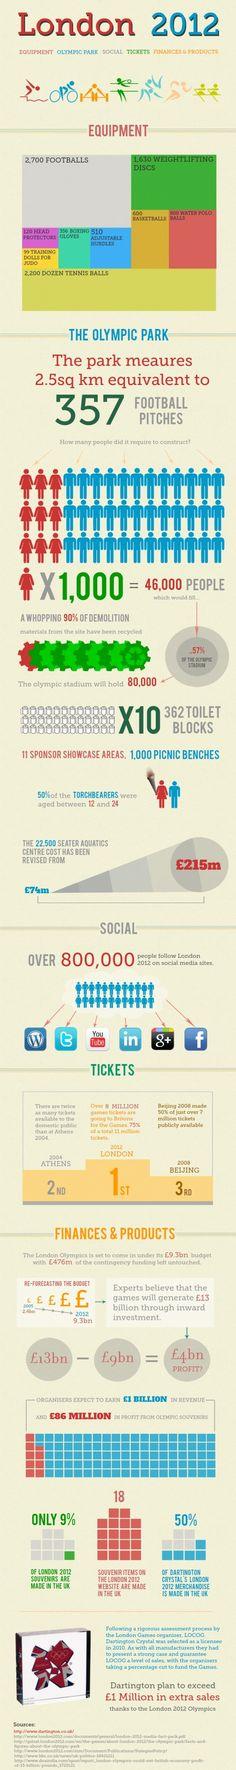 London 2012 Infographic